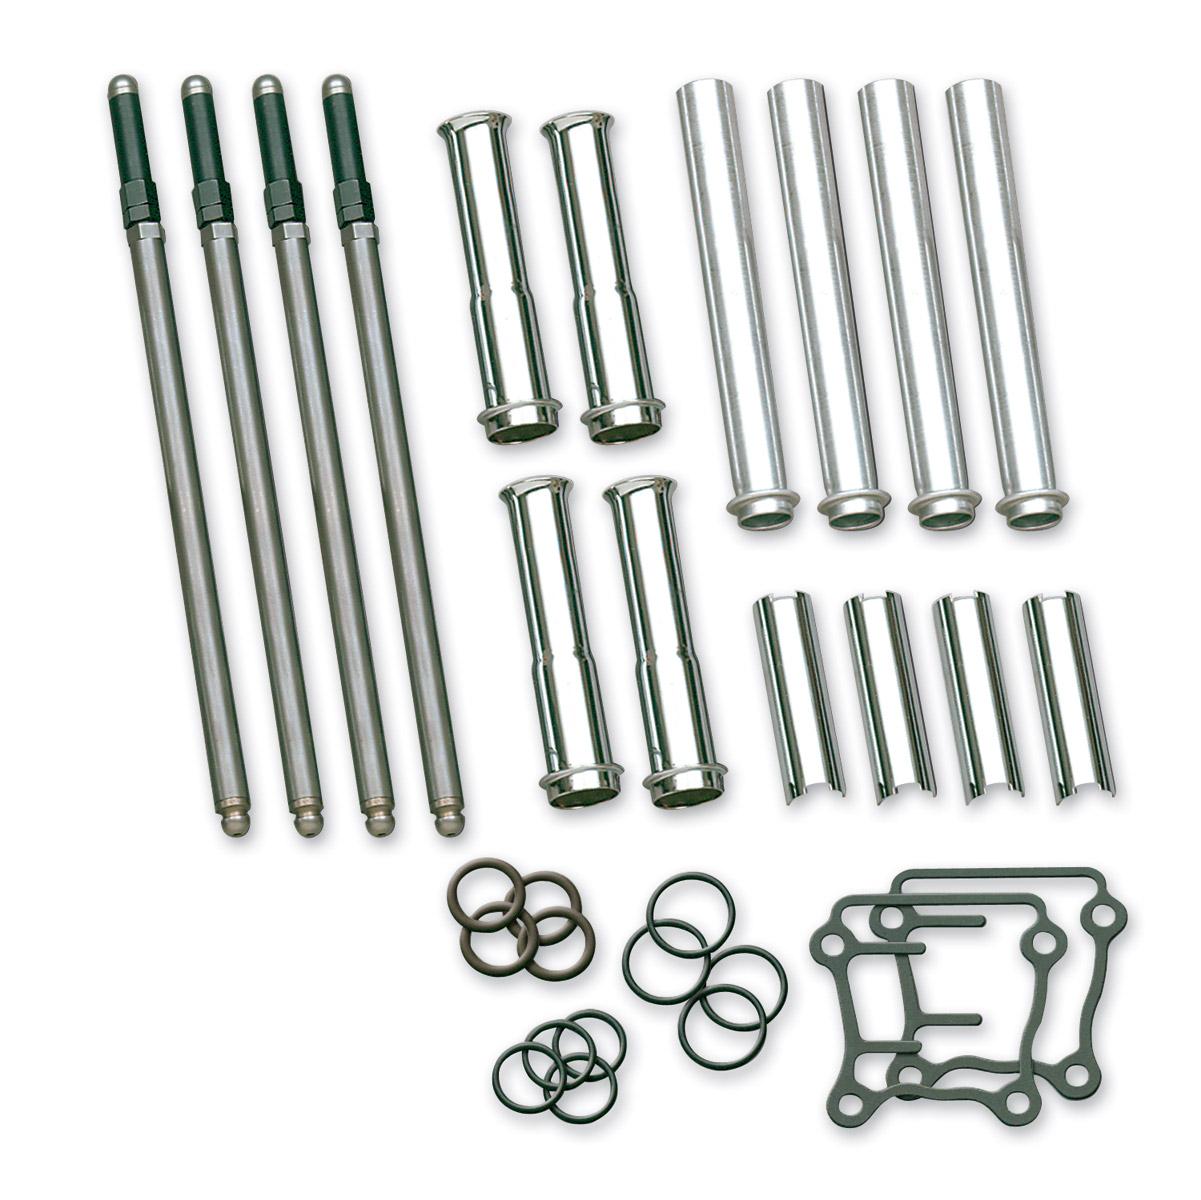 Ss Cycle Adjustable Pushrod Complete Kit 432 650 Jp Cycles 08 Kawasaki 650r Wiring Harness